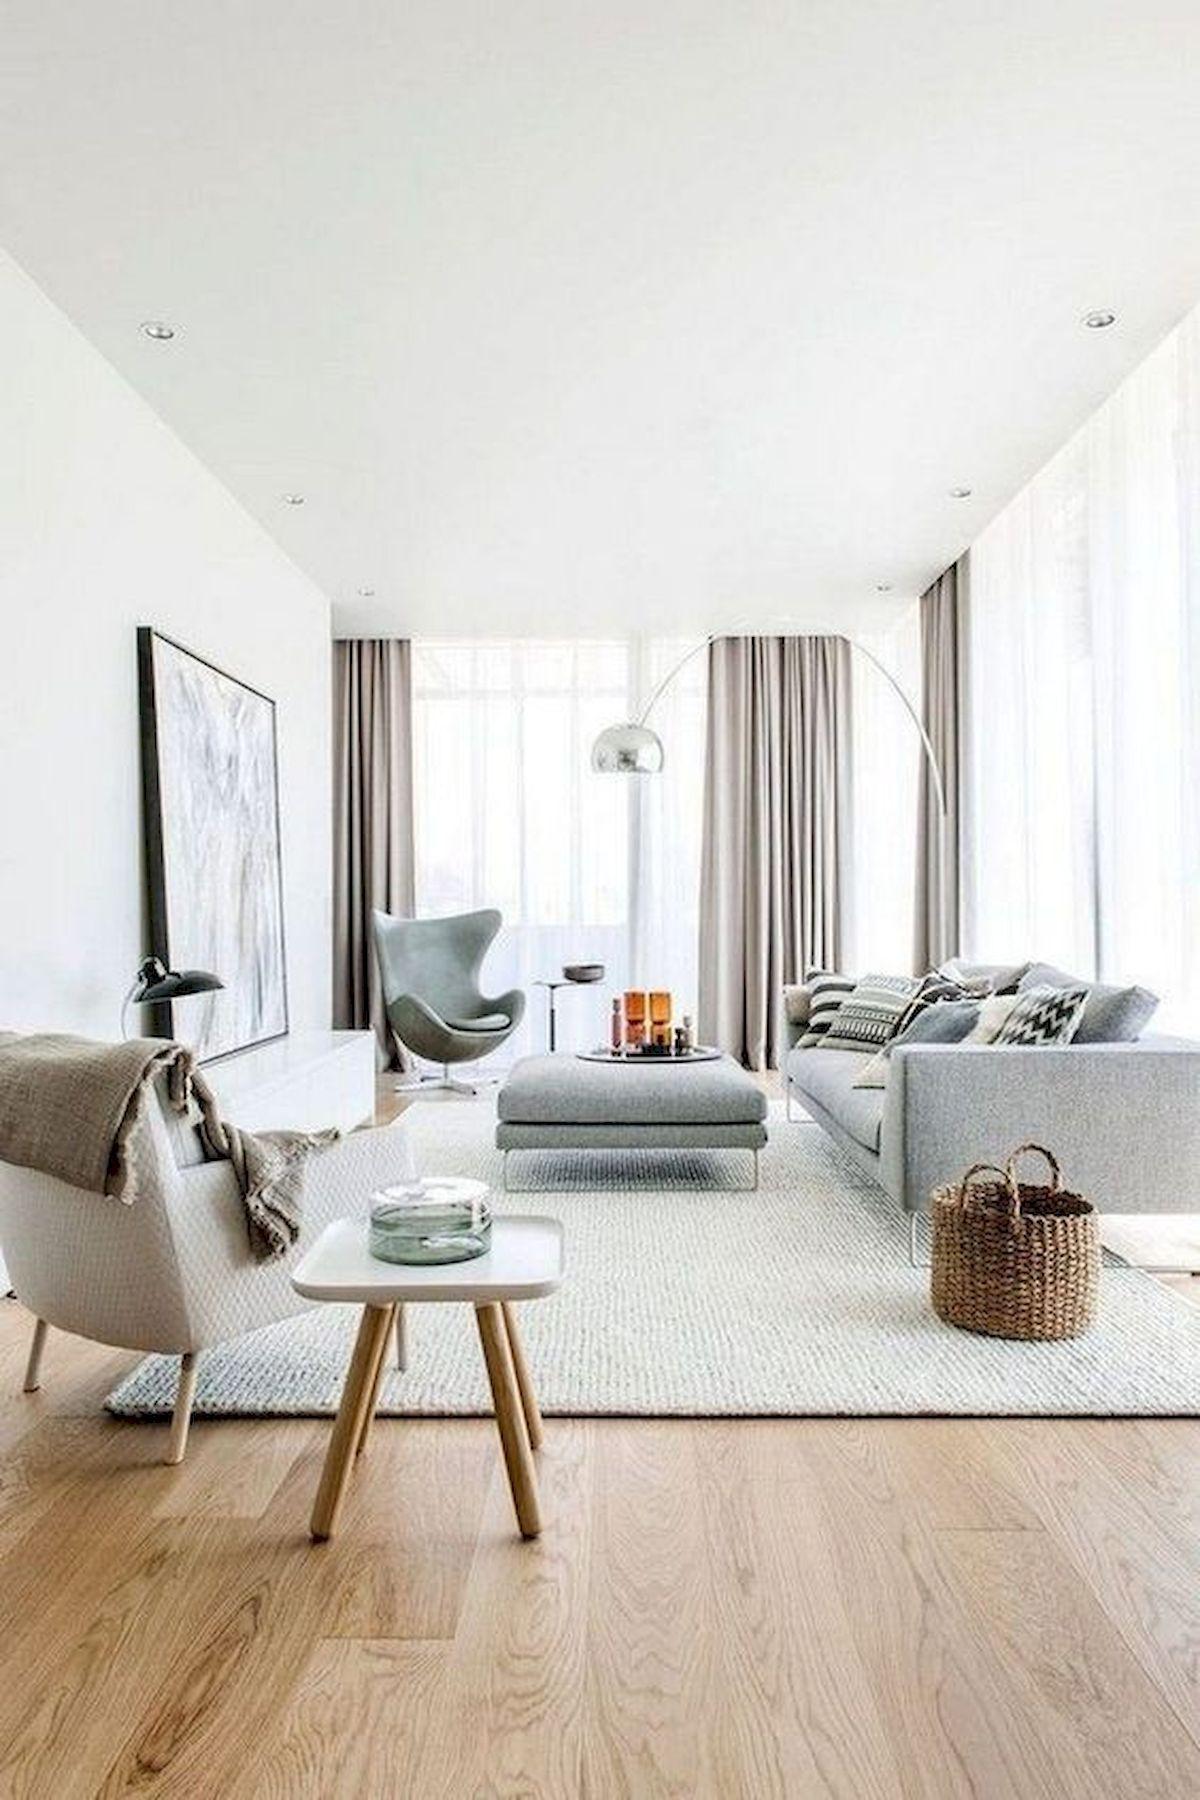 35 Stunning Scandinavian Interior Design and Decor Ideas (4)